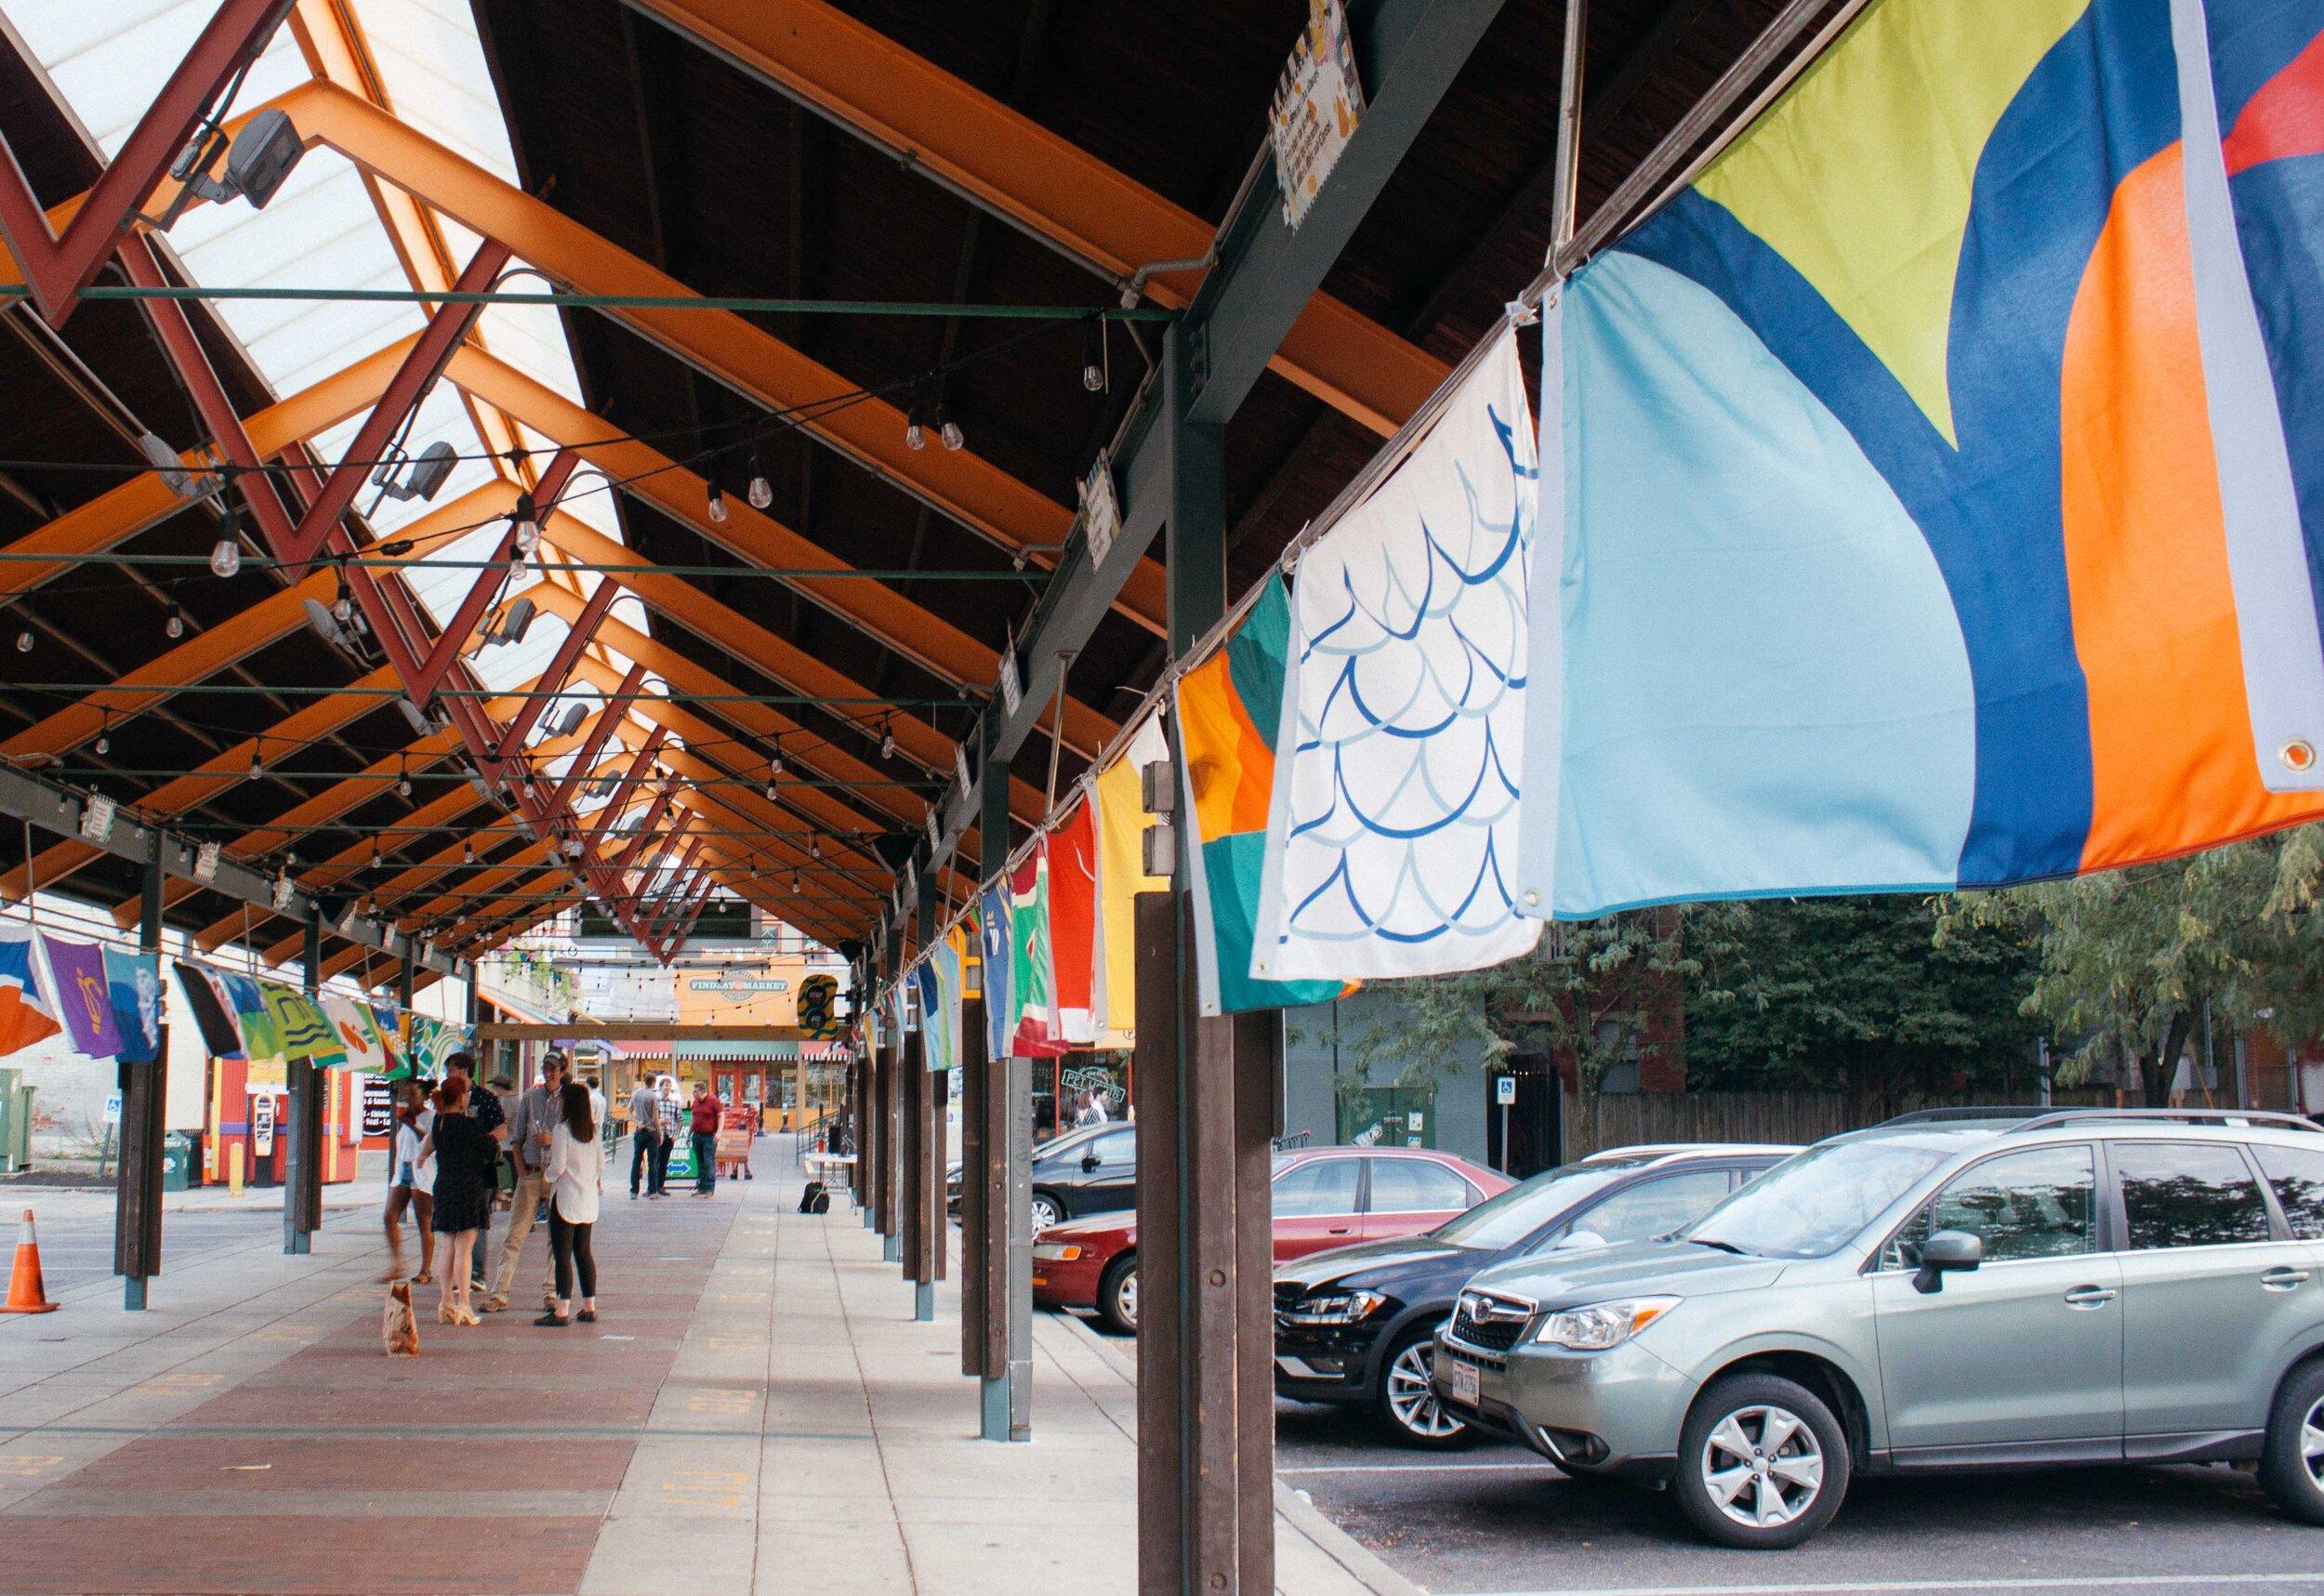 Cincy-Flags-Unveiled-Trischler-Design-7.jpg